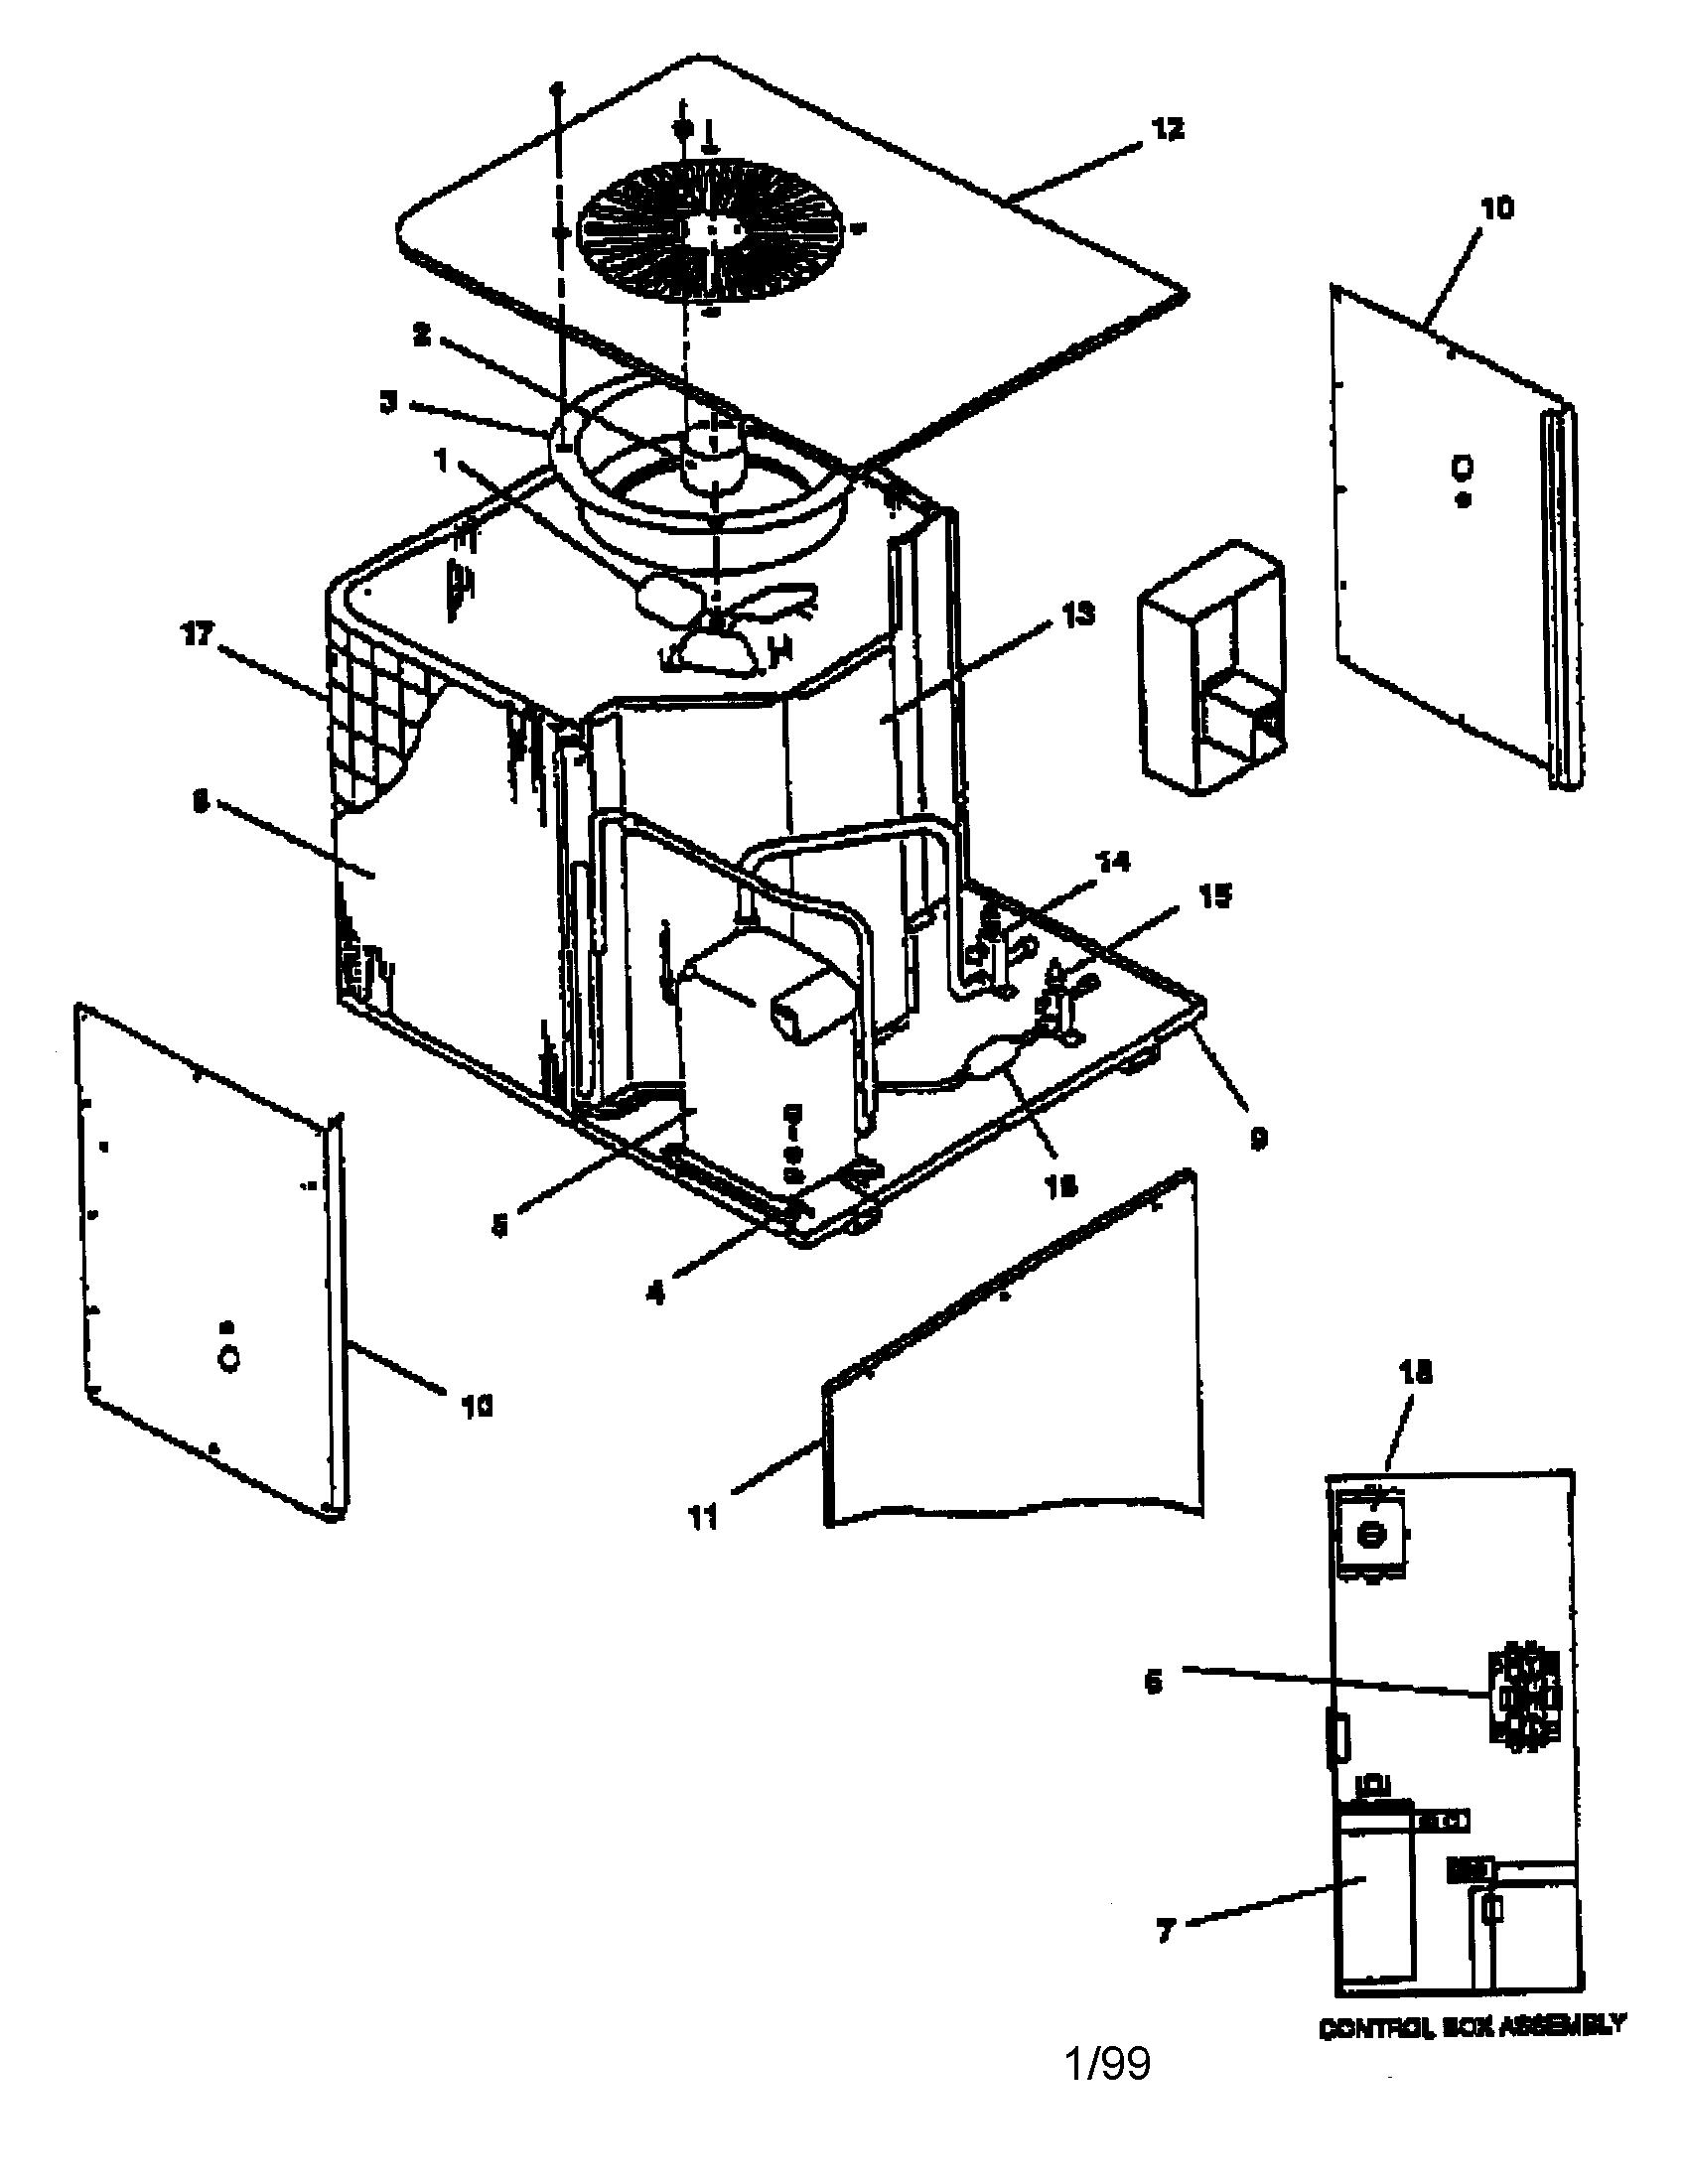 Goodman model CE48-3GB air-conditioner/heat pump(outside